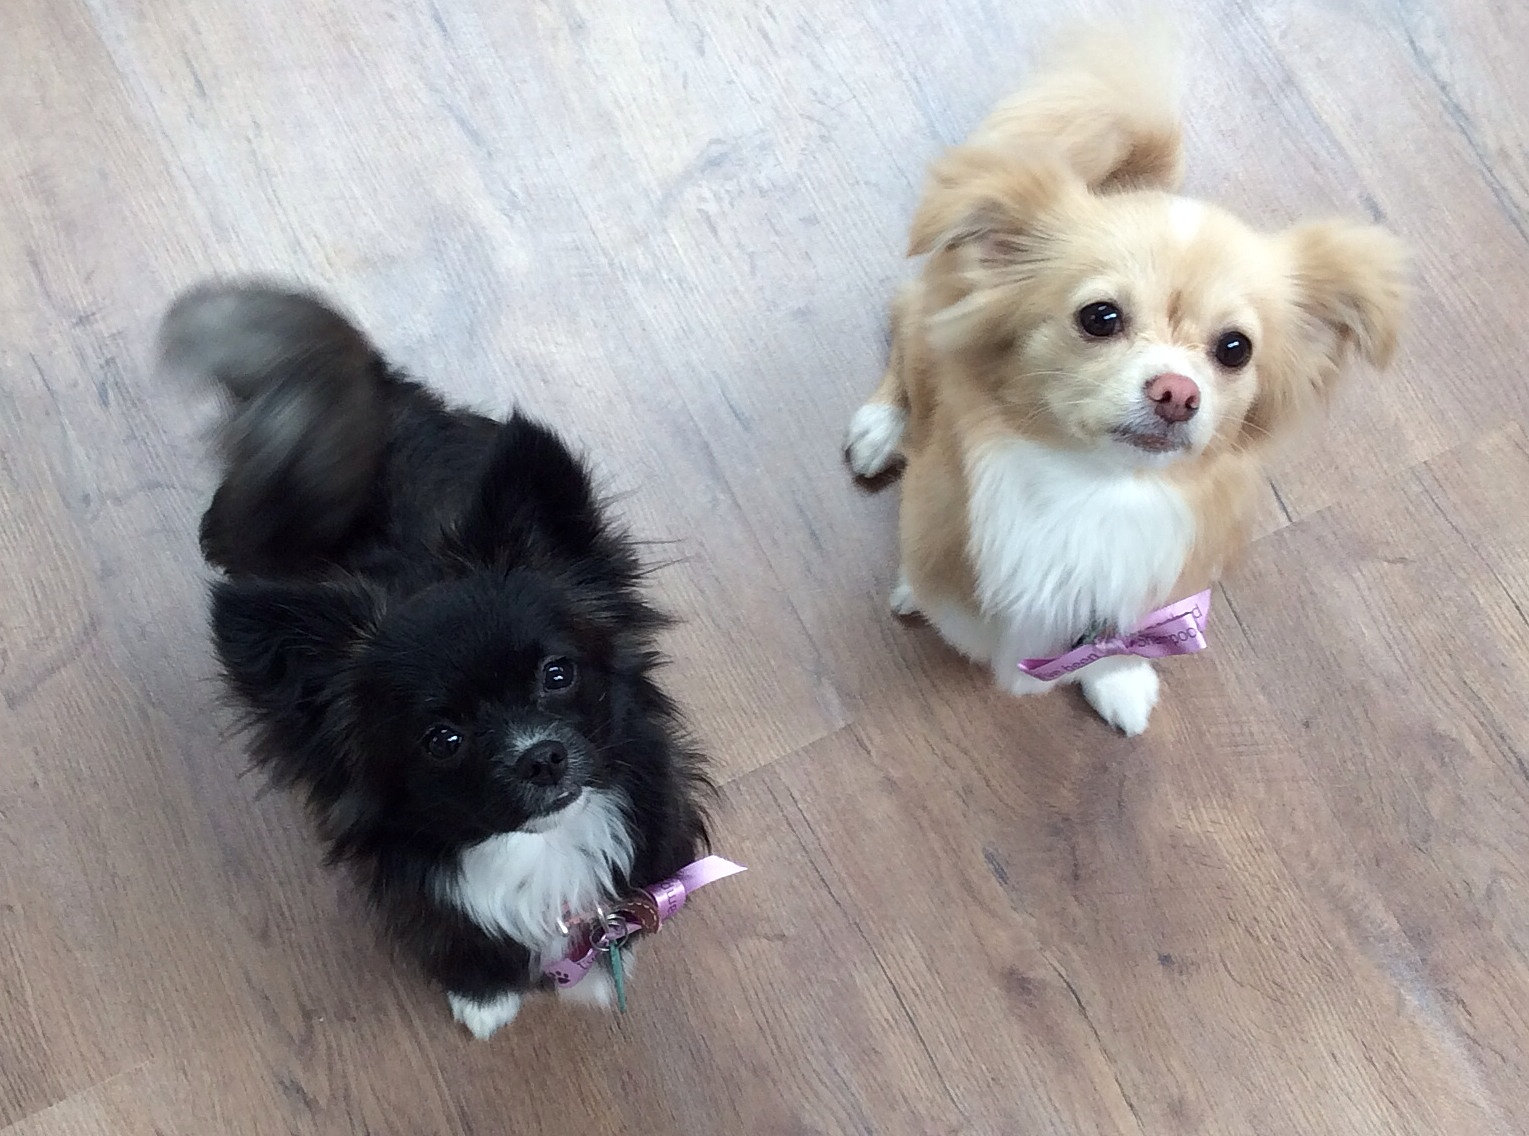 Shampooch Dog Grooming Salon, Scarborough | Chihuahua x Lhasa Apso